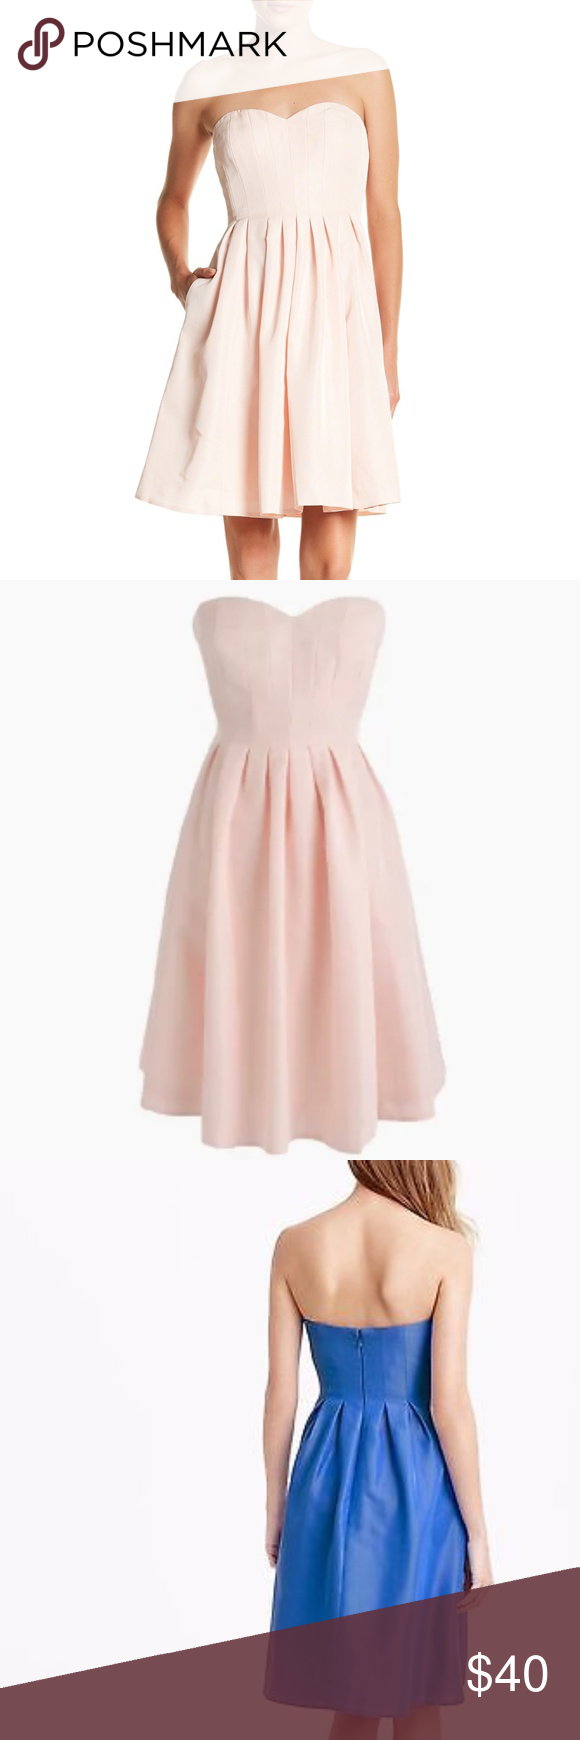 Pink cocktail dress for wedding  J Crew Wedding Marlie Strapless Bridesmaid Dress  Dress brands